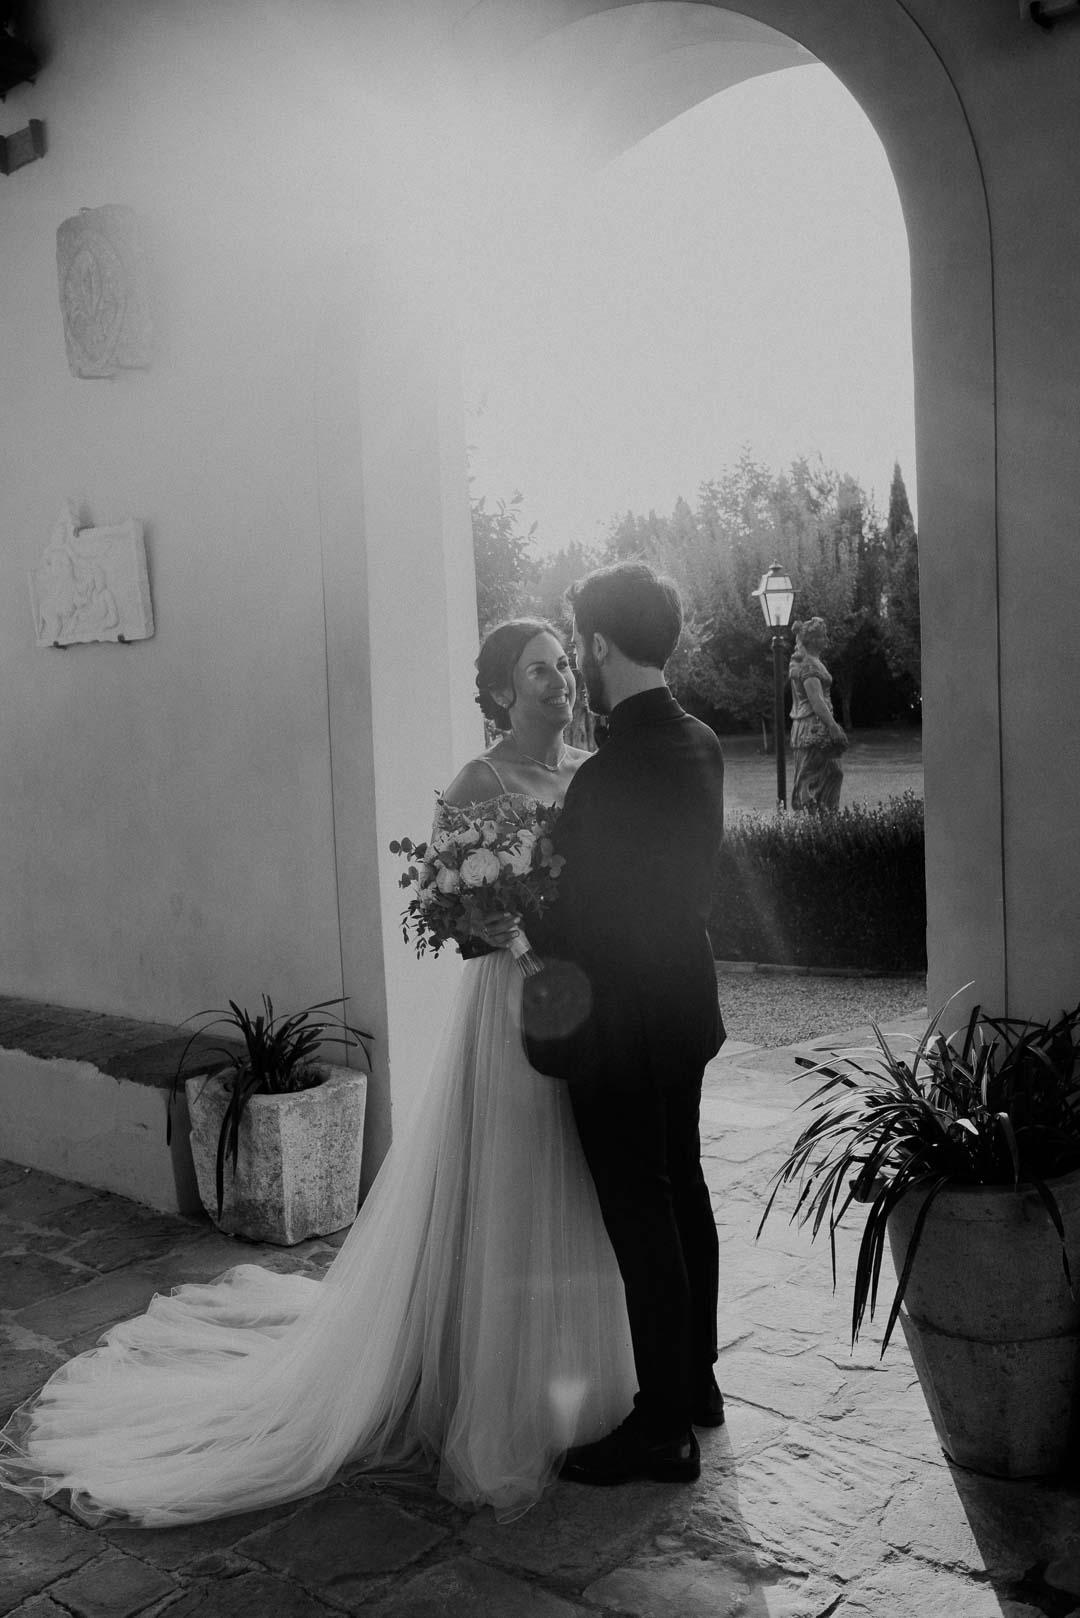 wedding-photographer-destination-fineart-bespoke-reportage-tuscany-villascorzi-vivianeizzo-spazio46-103